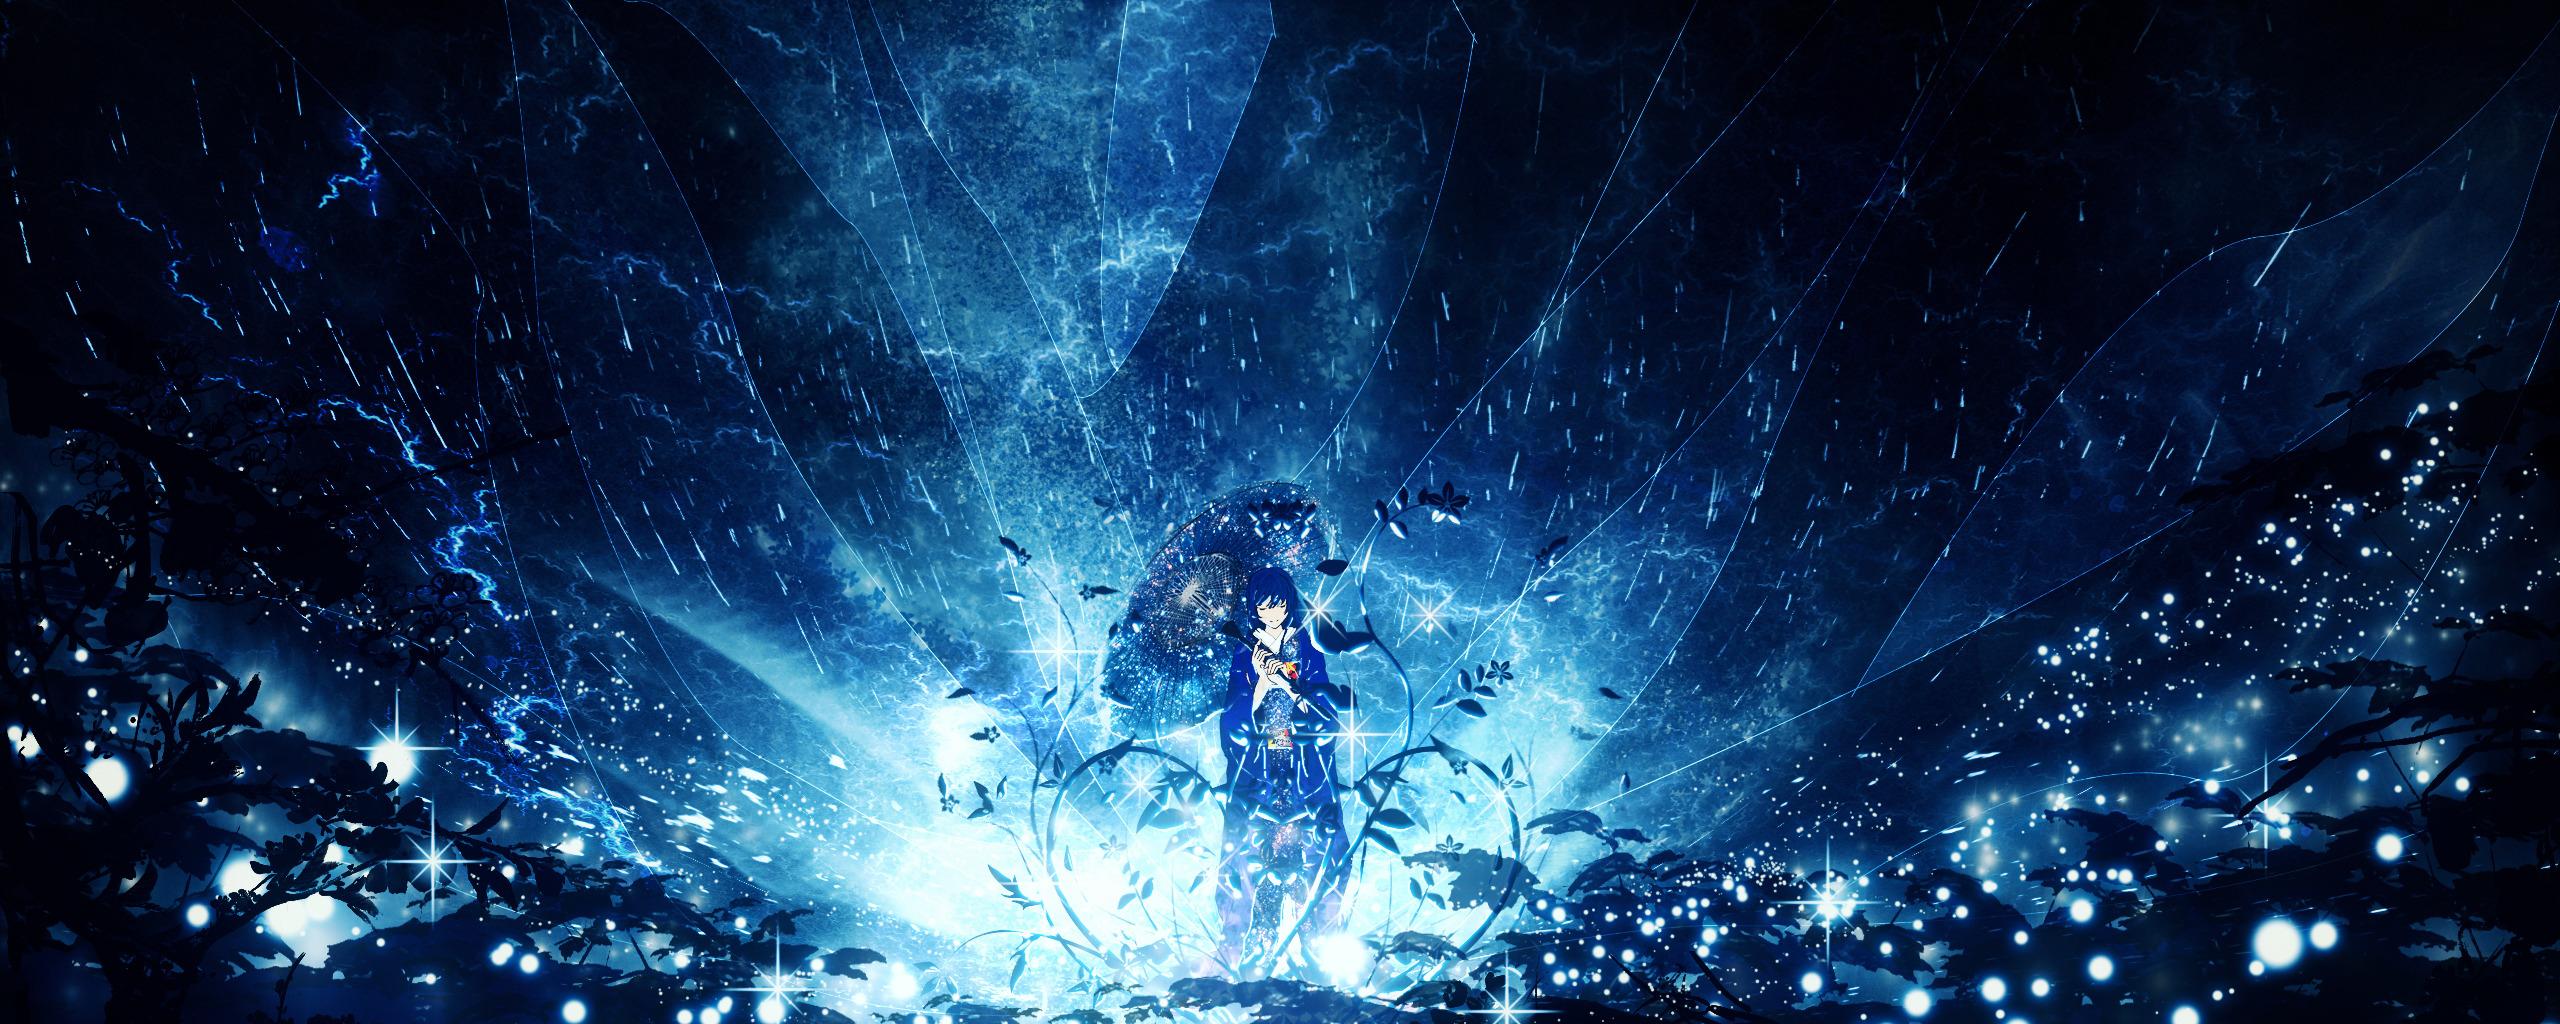 Download 2560x1024 Wallpaper Anime Girl Outdoor Night Original